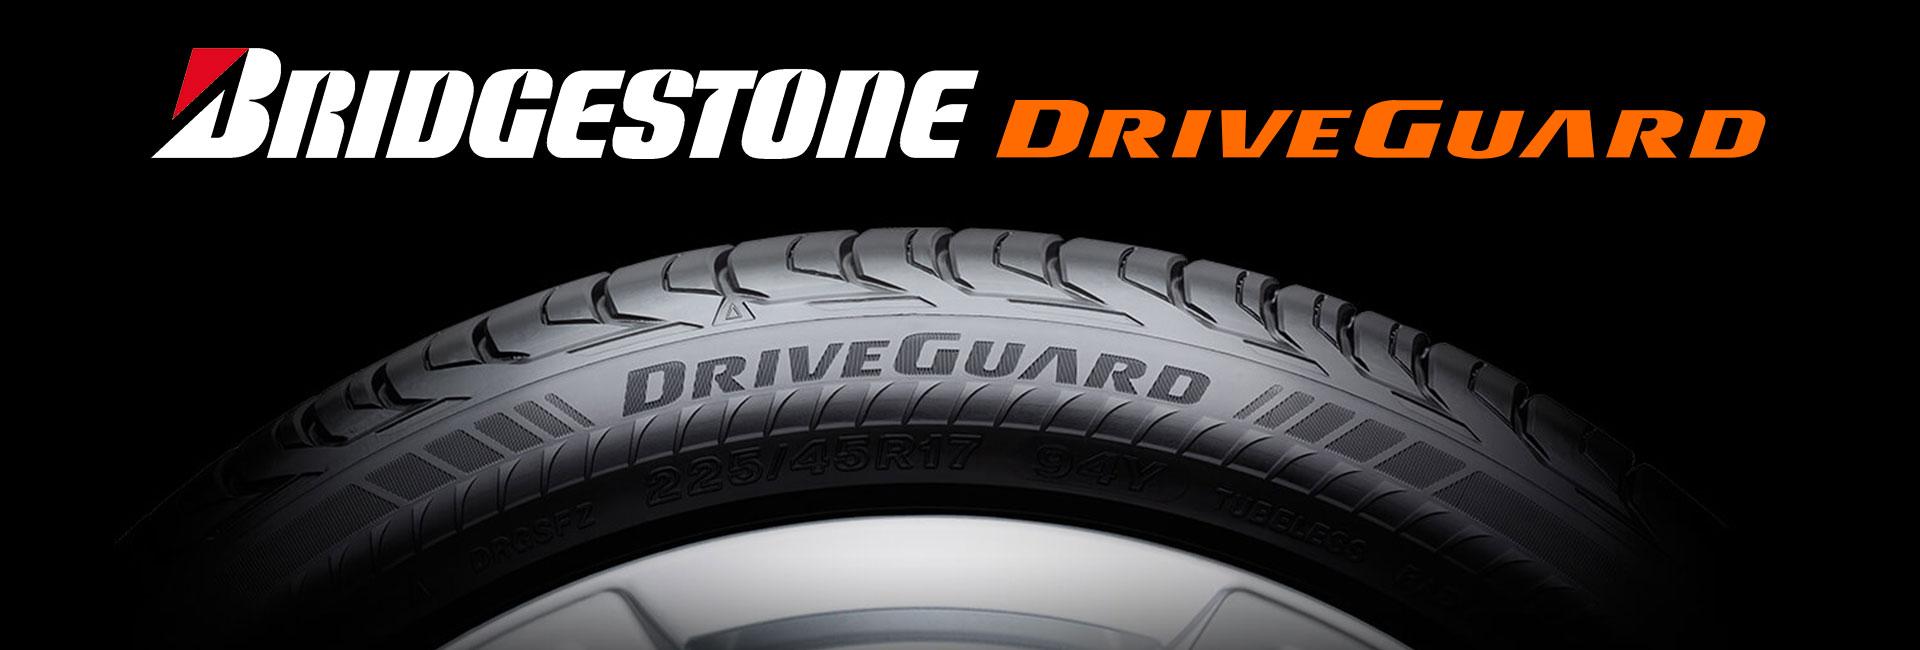 pneumatici-bridgestone-driveguard